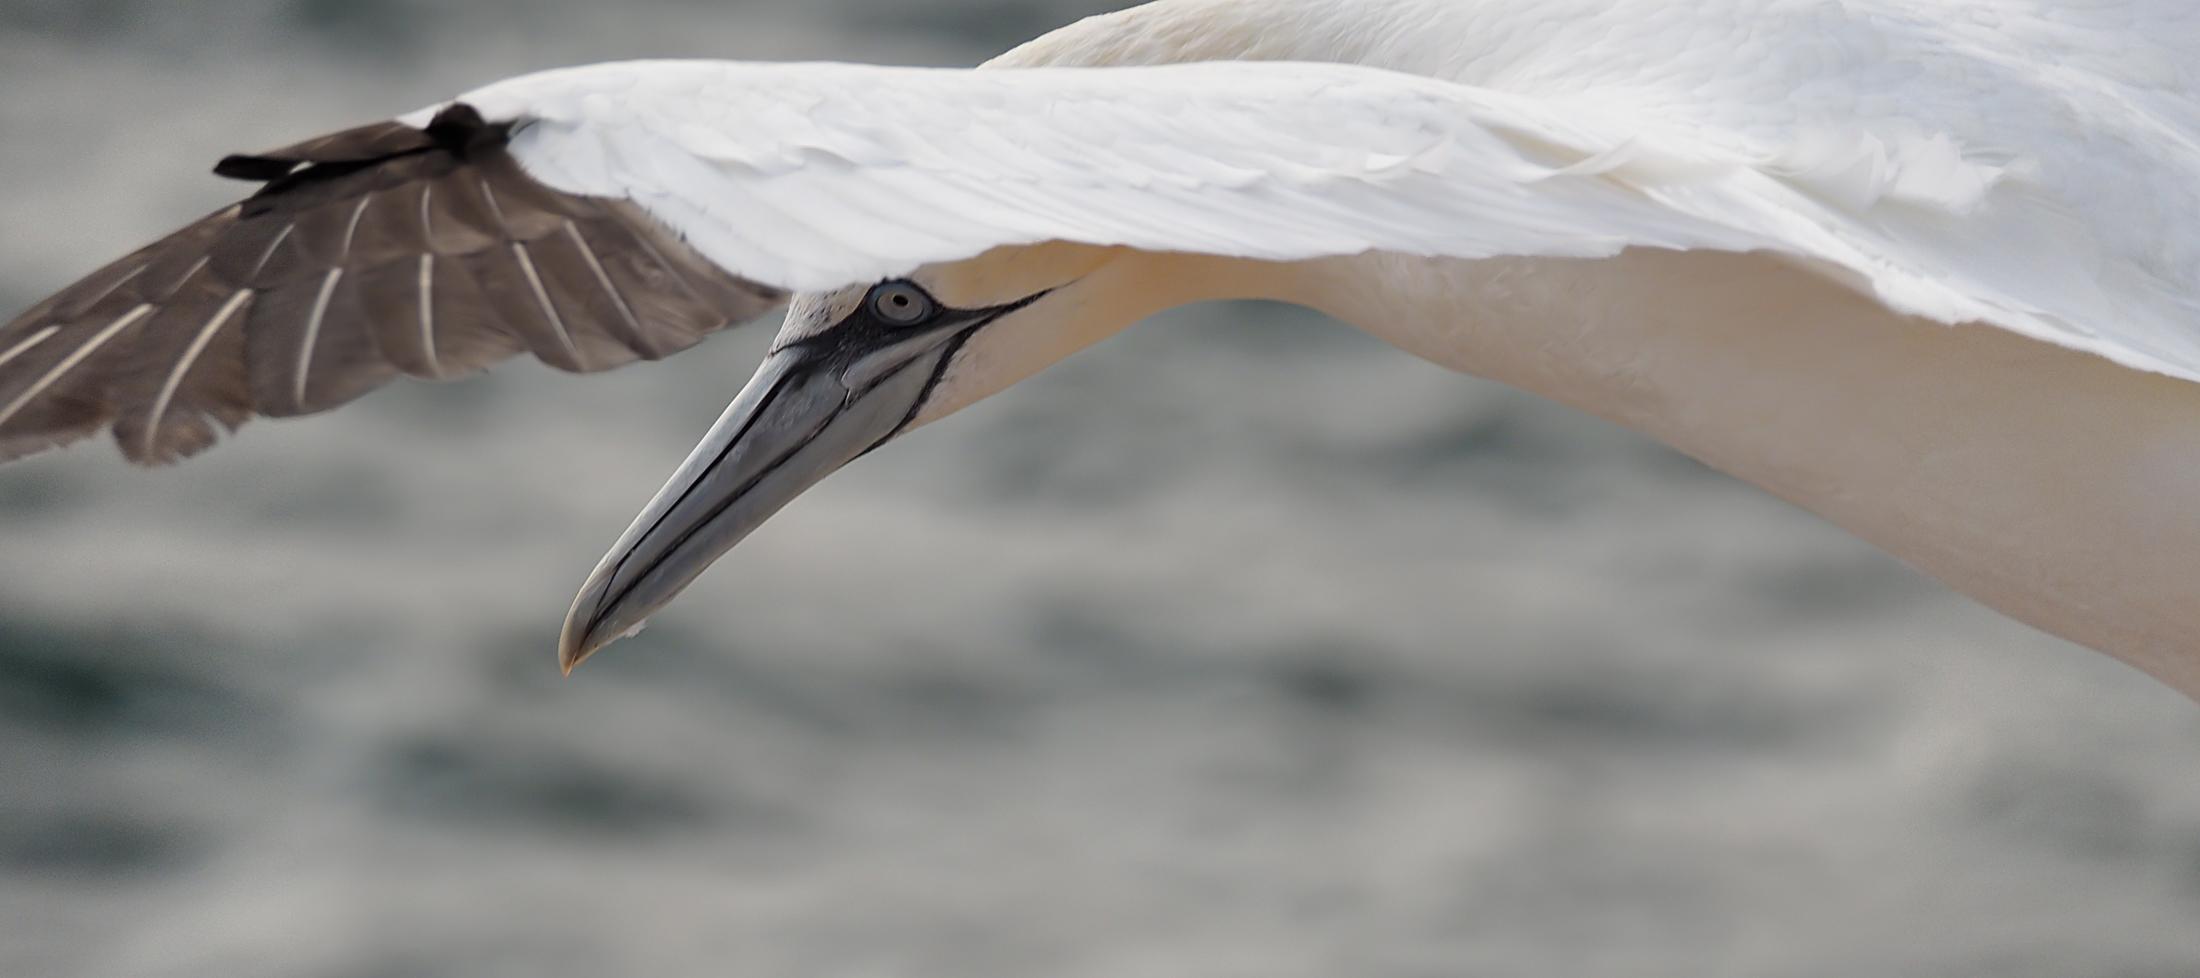 Basstölpel im Flug01 (Morus bassanus)